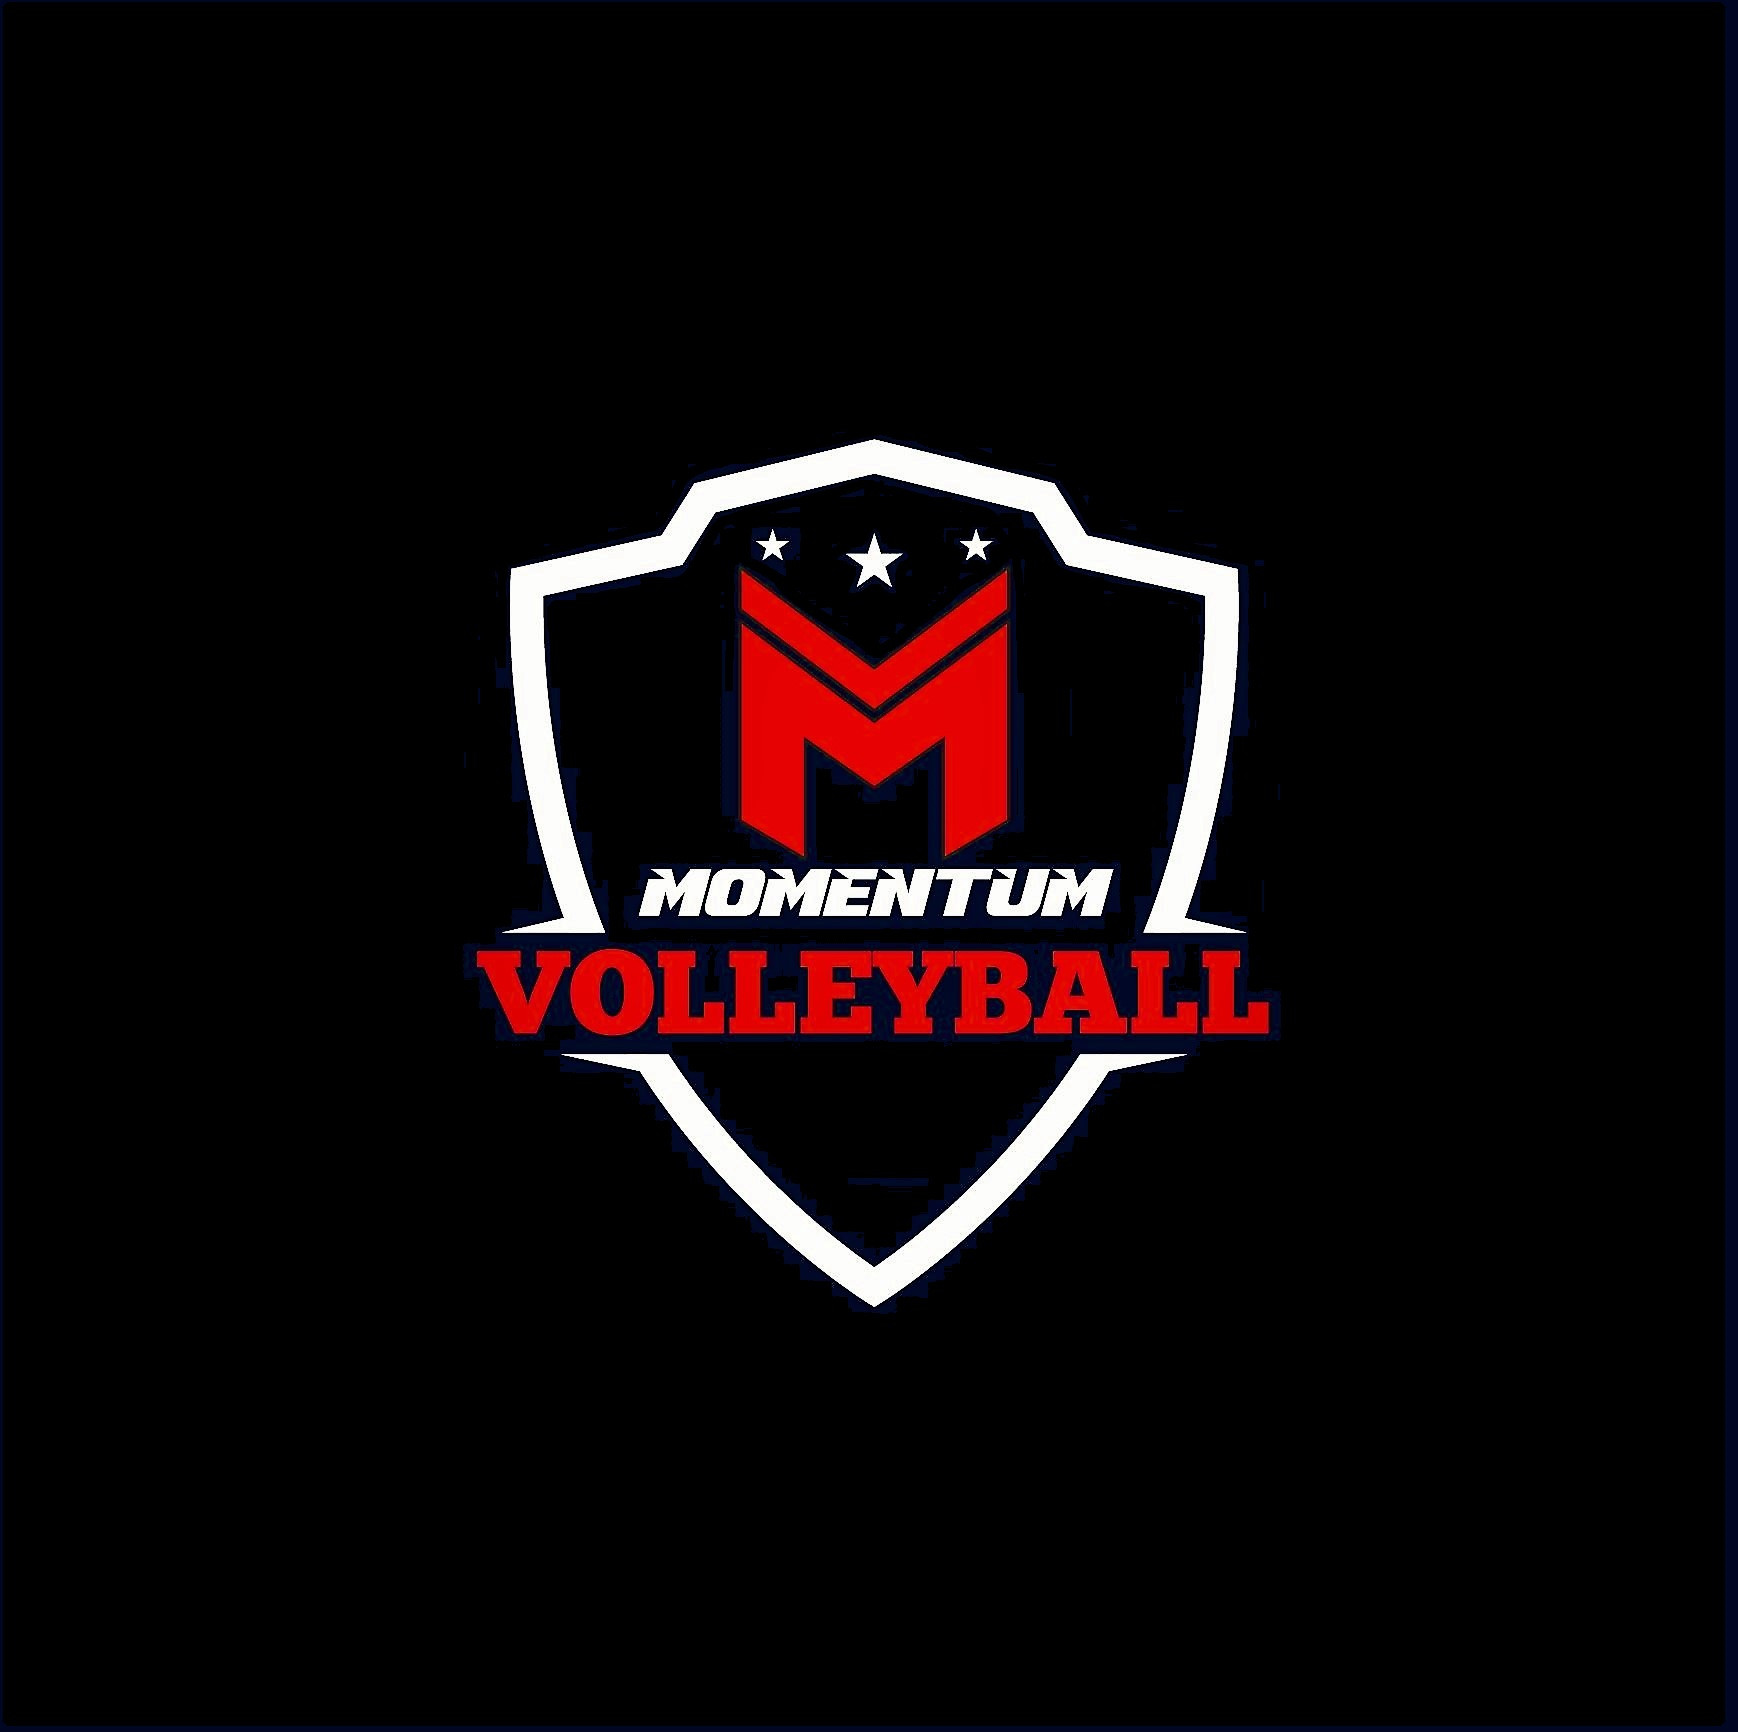 BOYS Club Volleyball| Peoria, AZ | Momentum Volleyball Club